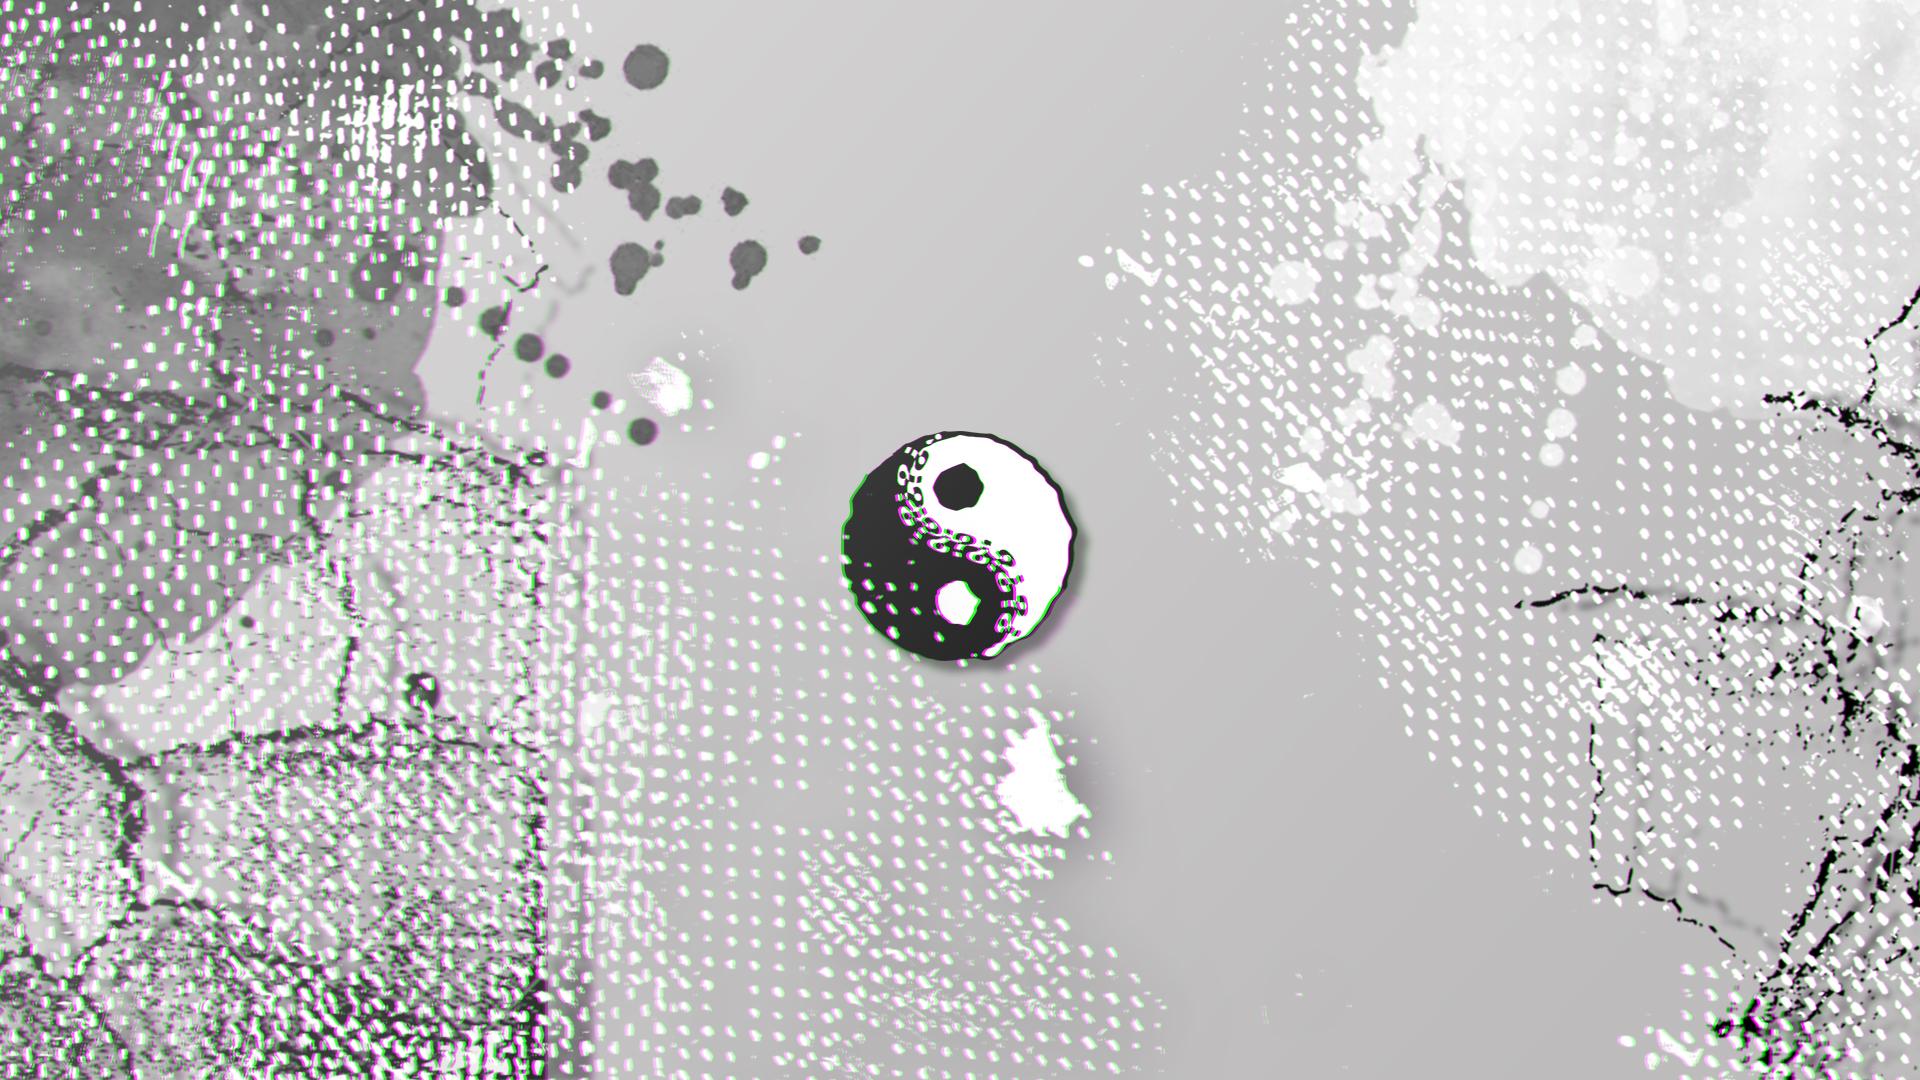 Wallpapers For Desktop Yin And Yang